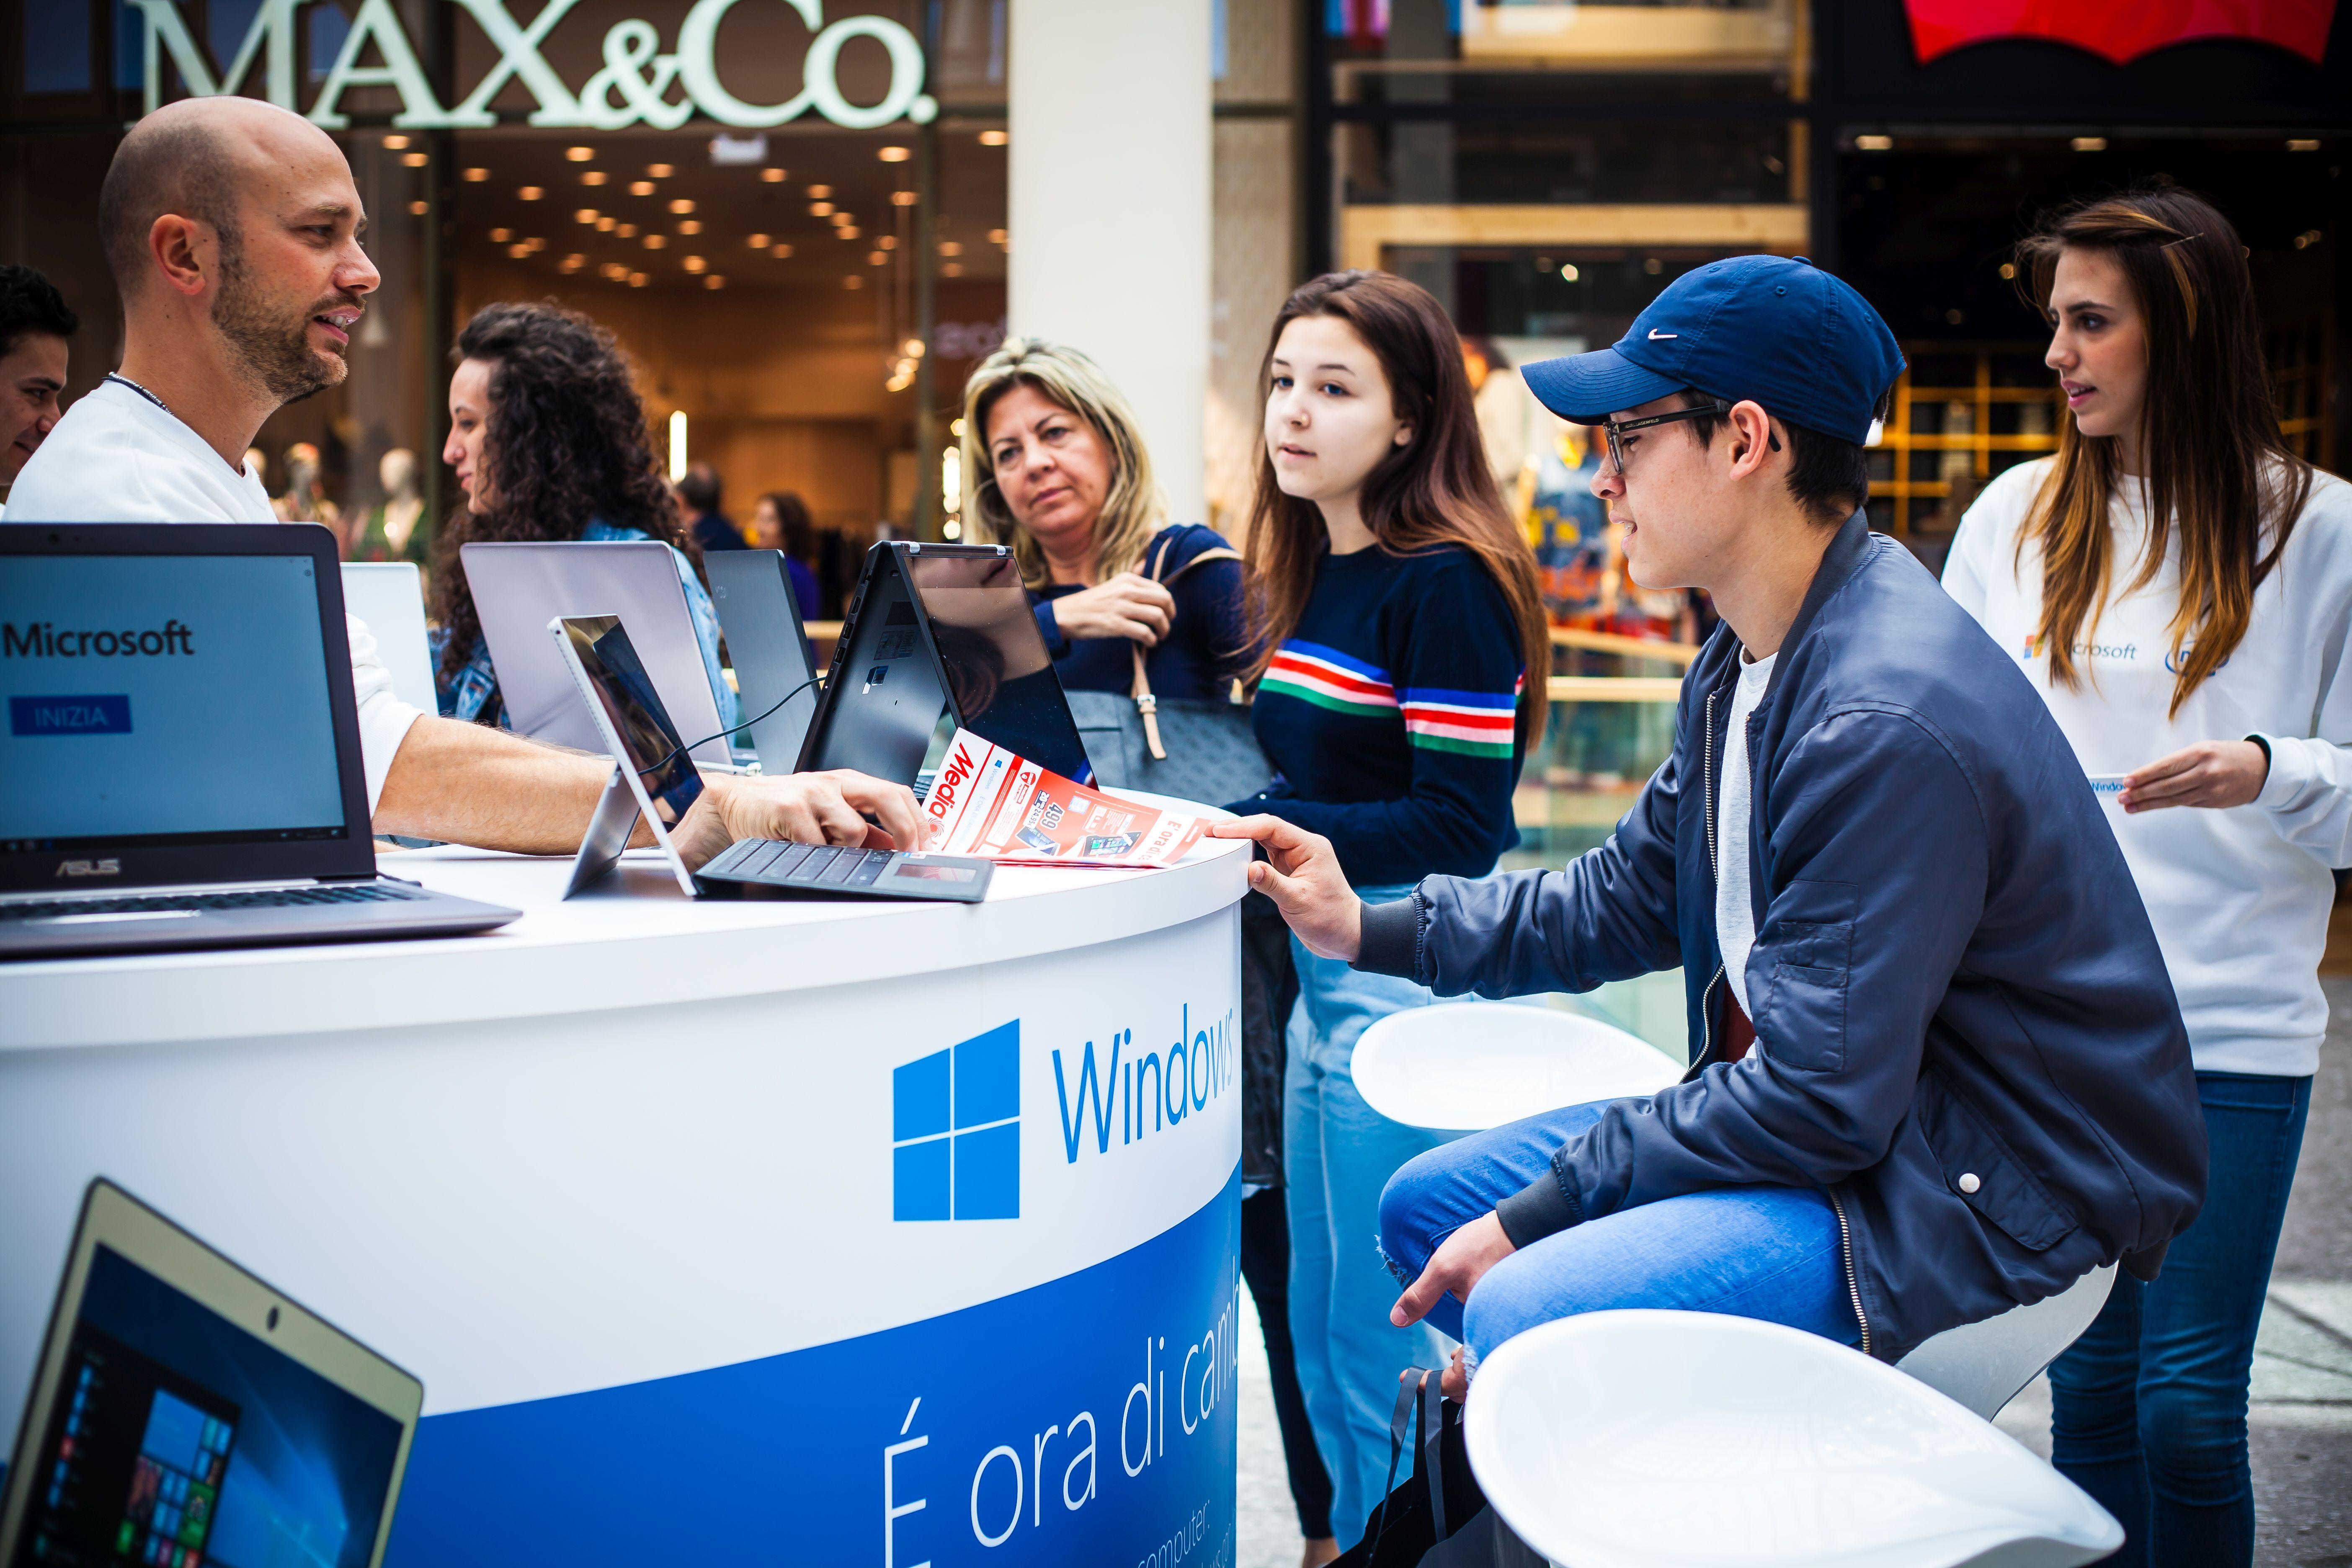 Staff and Customers